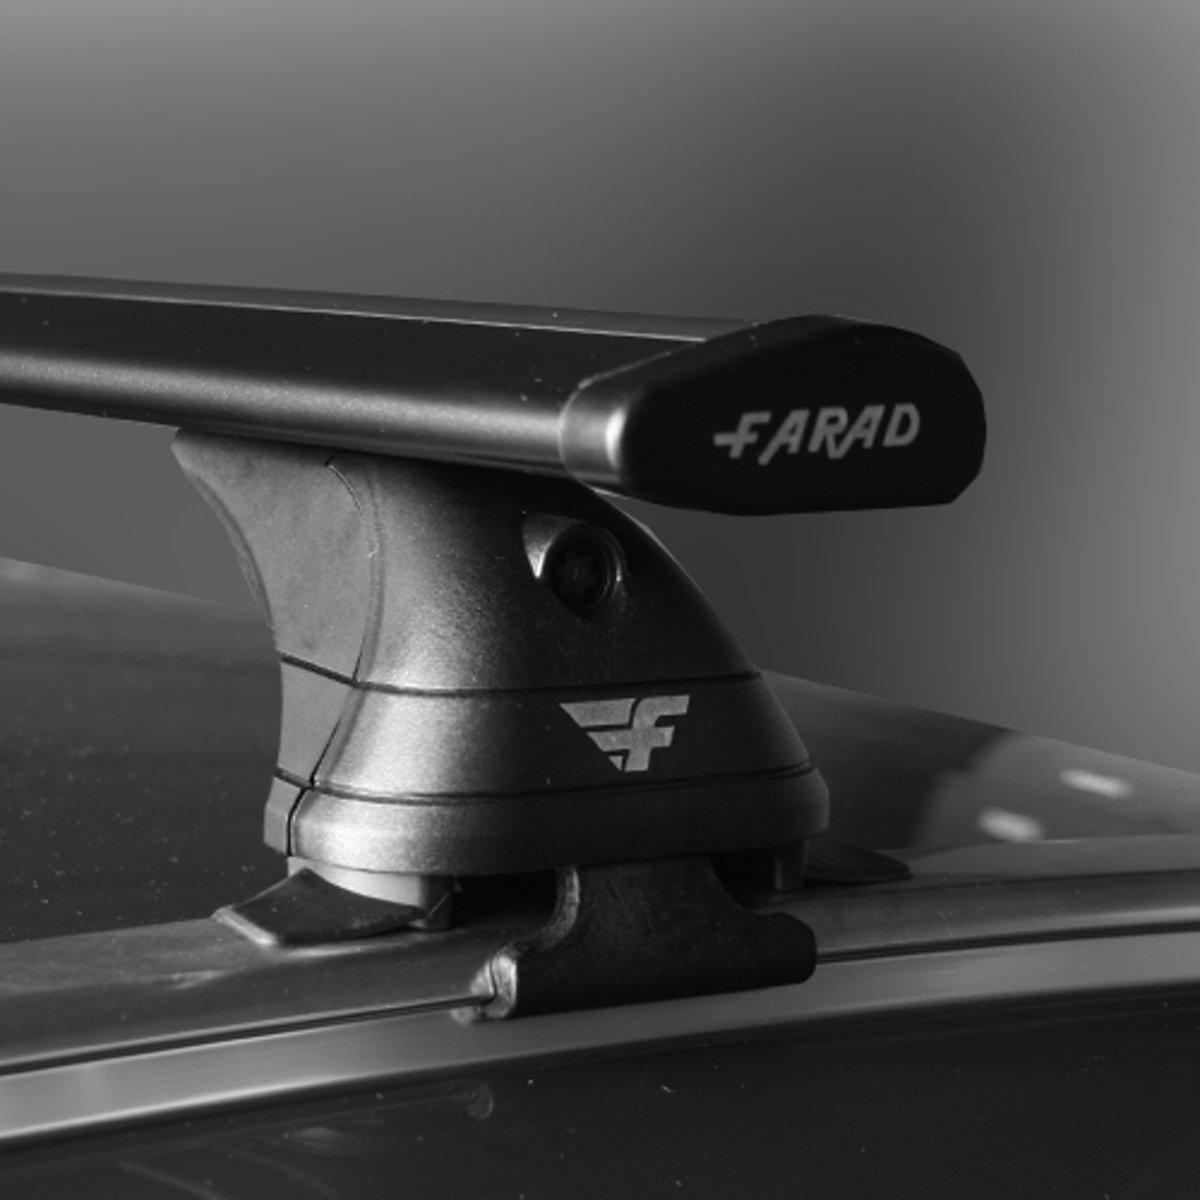 Dakdragers Audi Q5 SUV vanaf 2017 - Farad aluminium wingbar zwart kopen